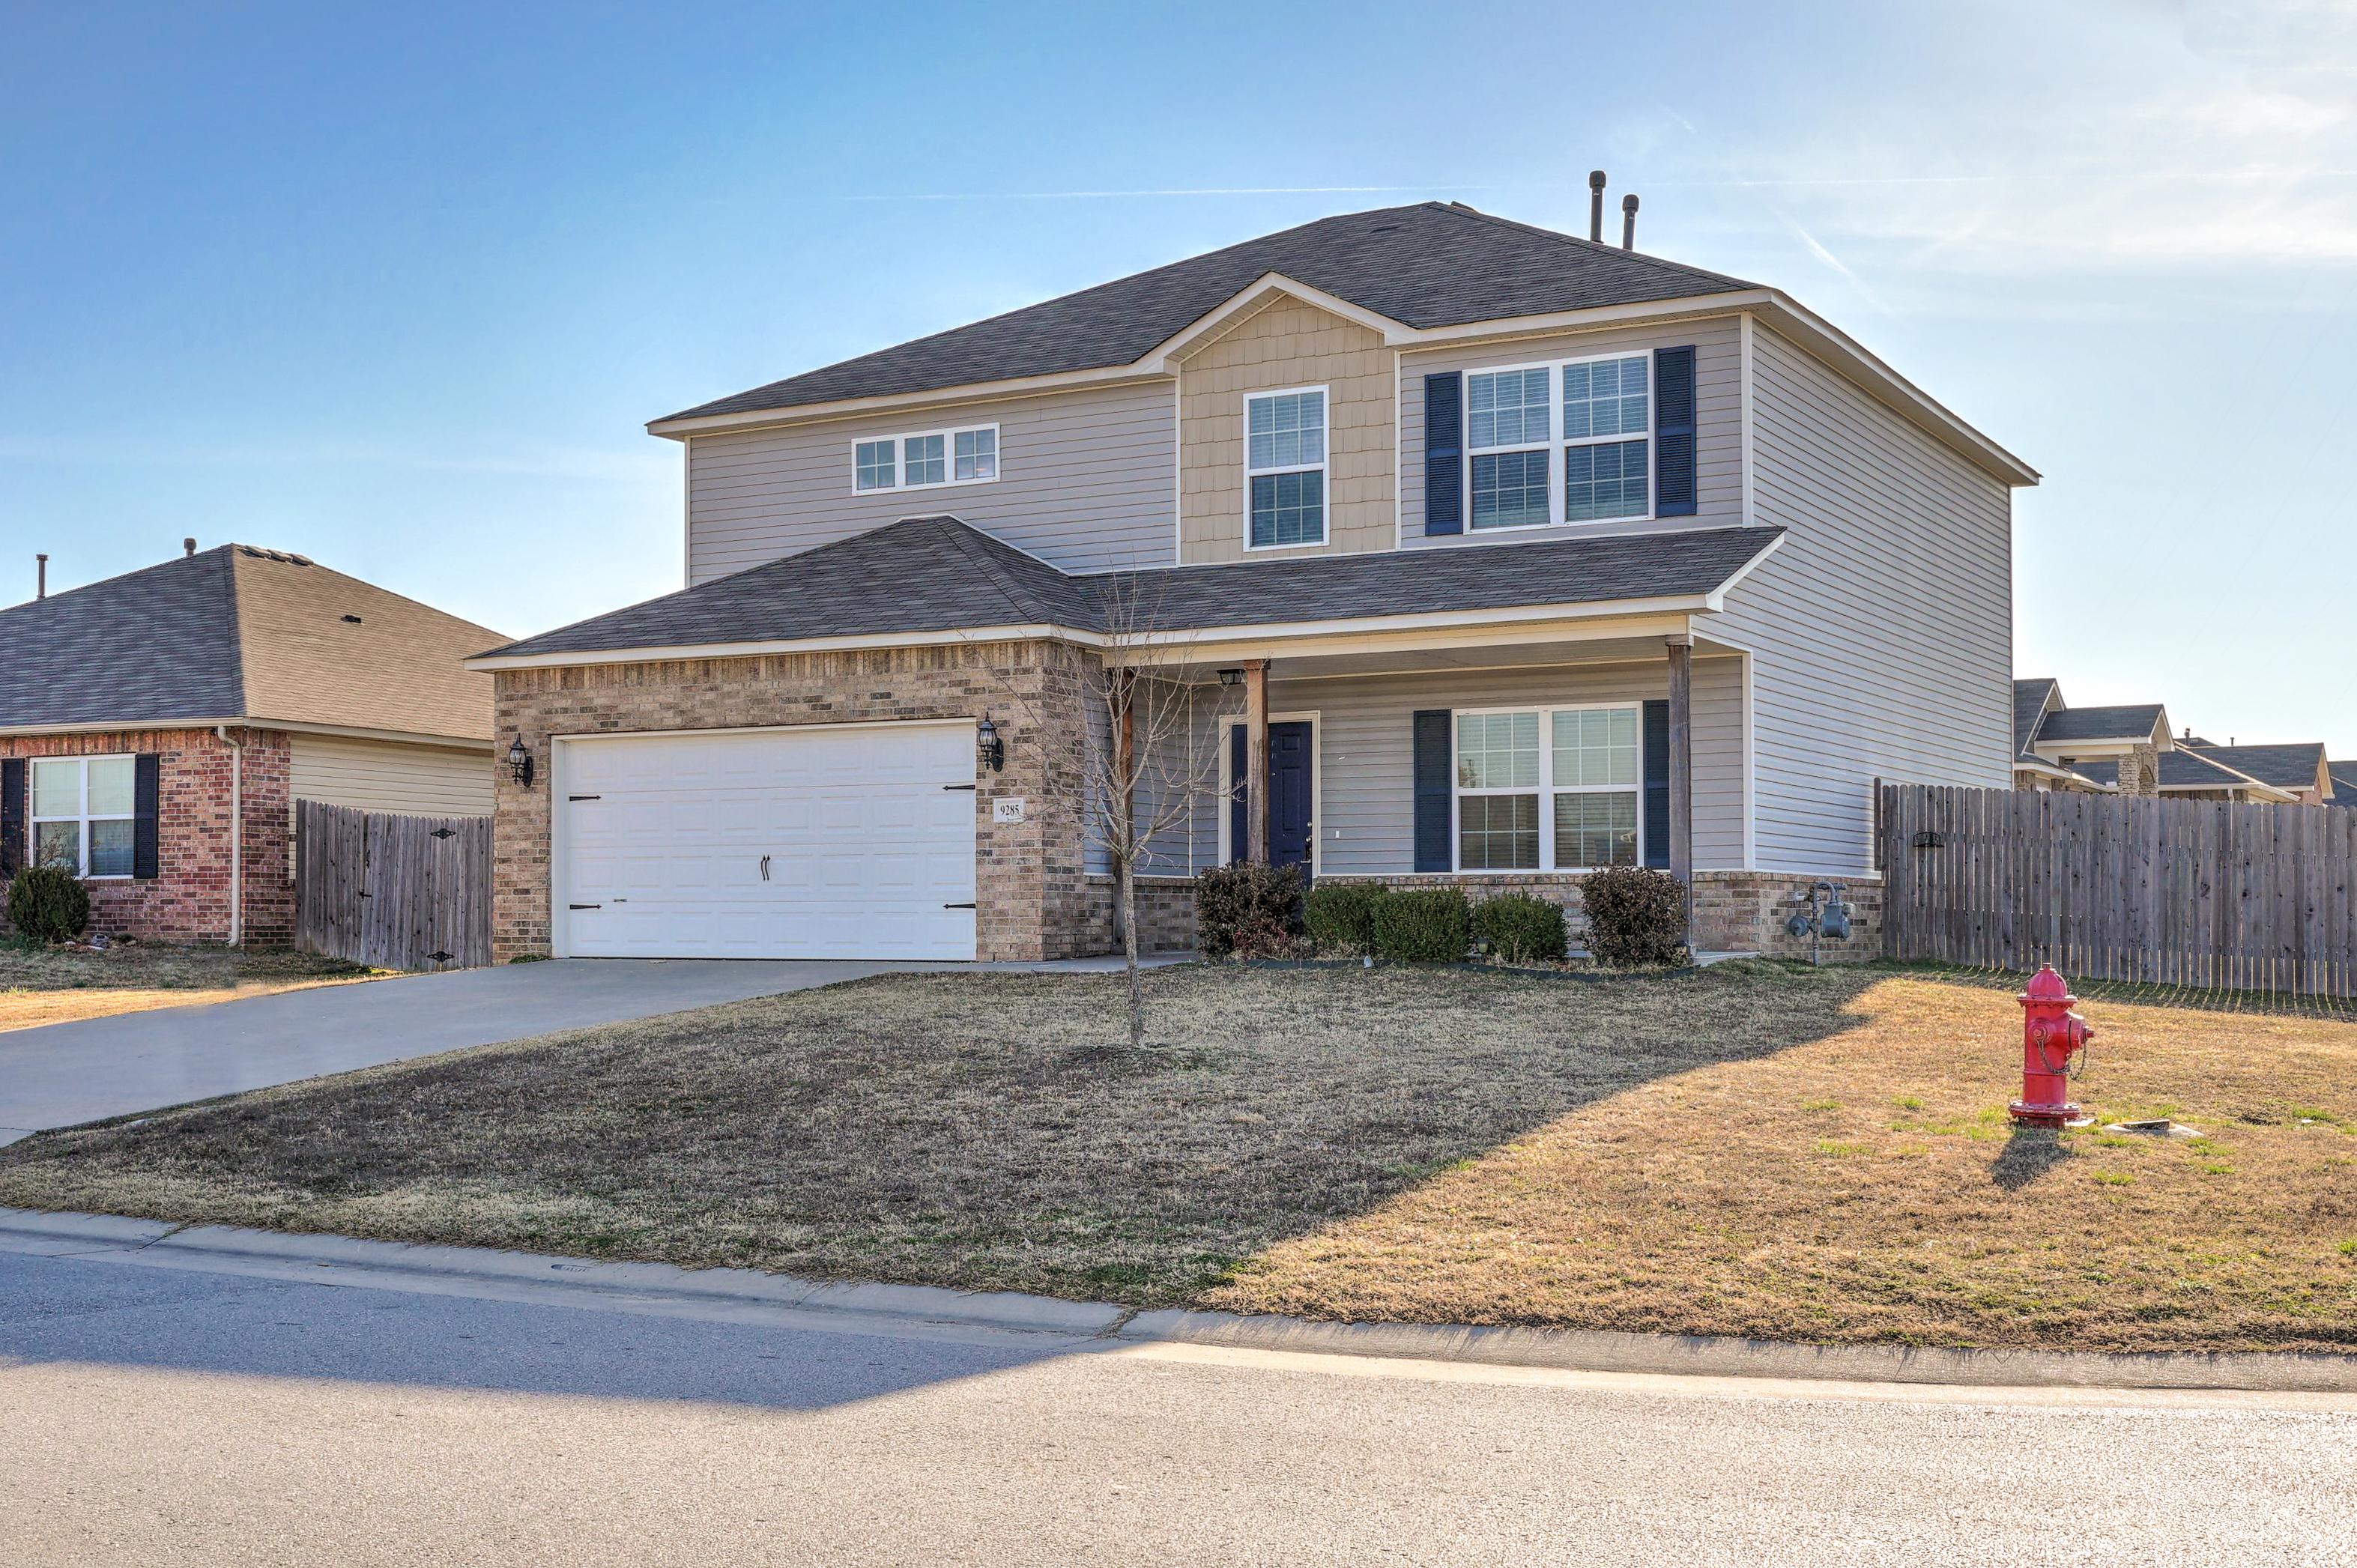 9285 S 251st East Avenue Property Photo 1